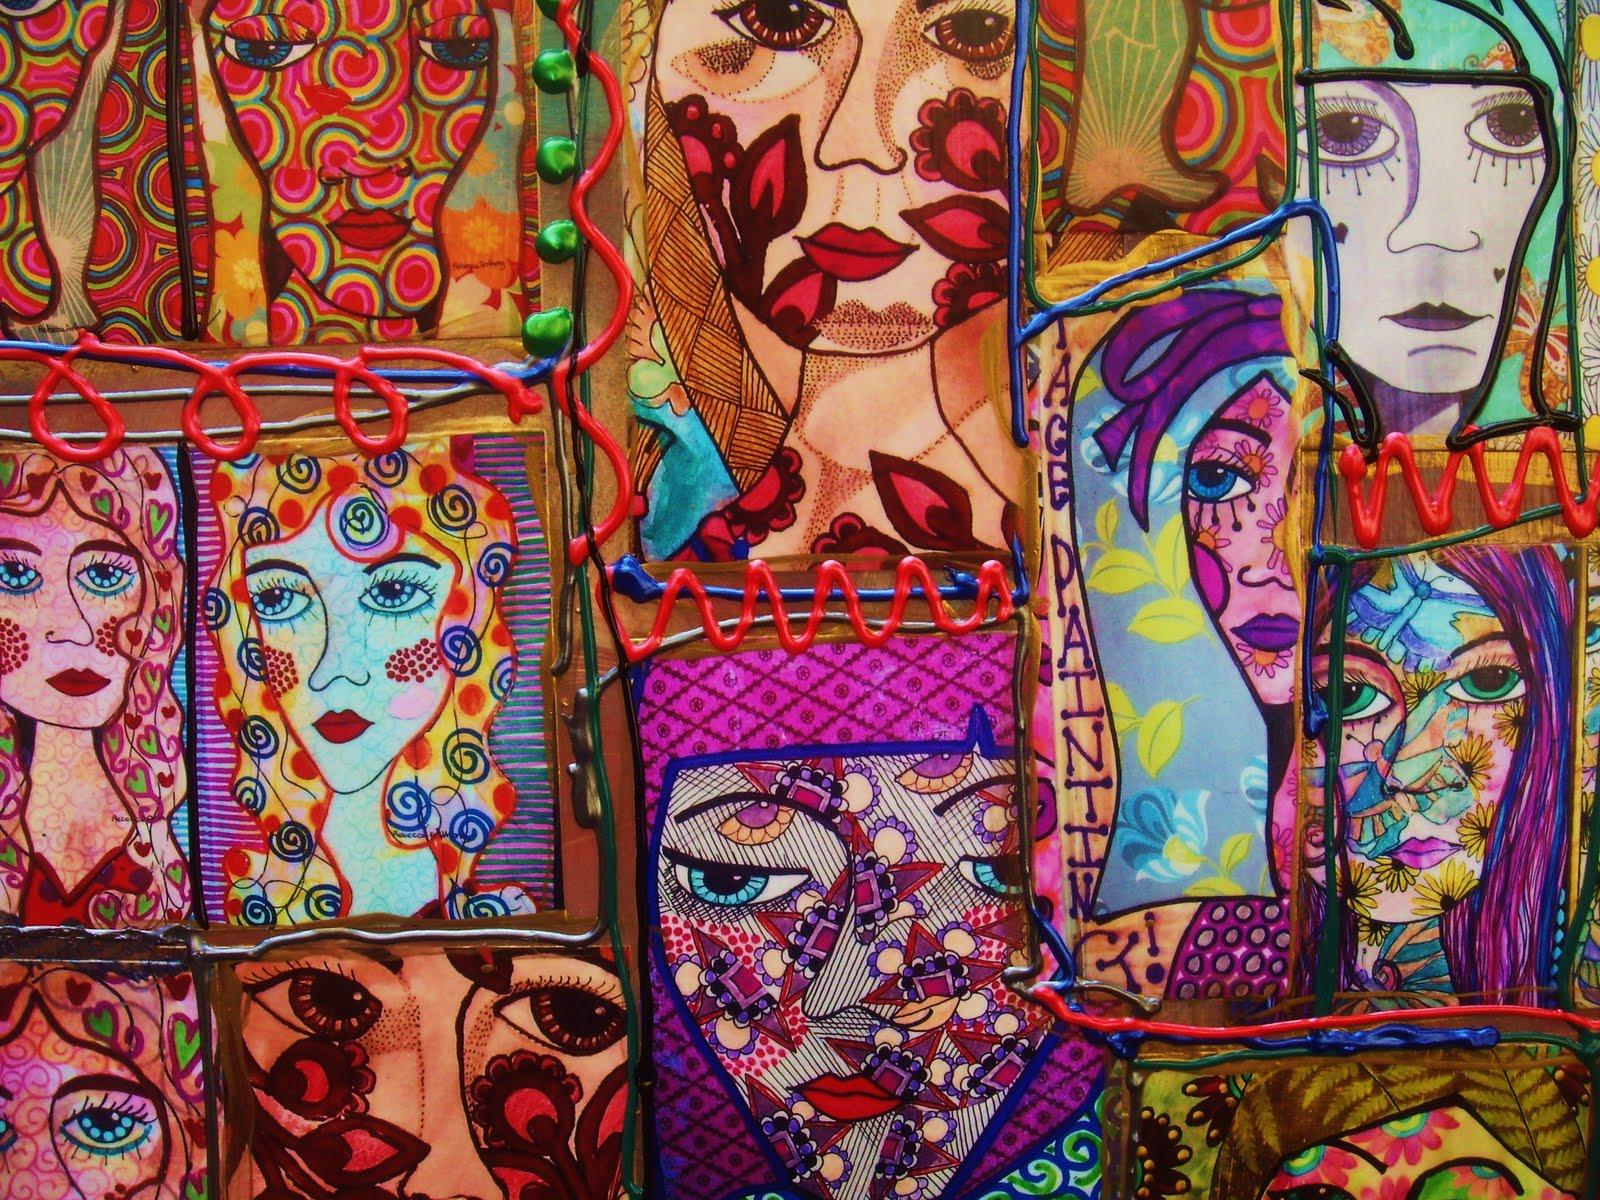 Sketchbook Cover Collage : Daisydolls gypsy caravan quot sketchbook collage